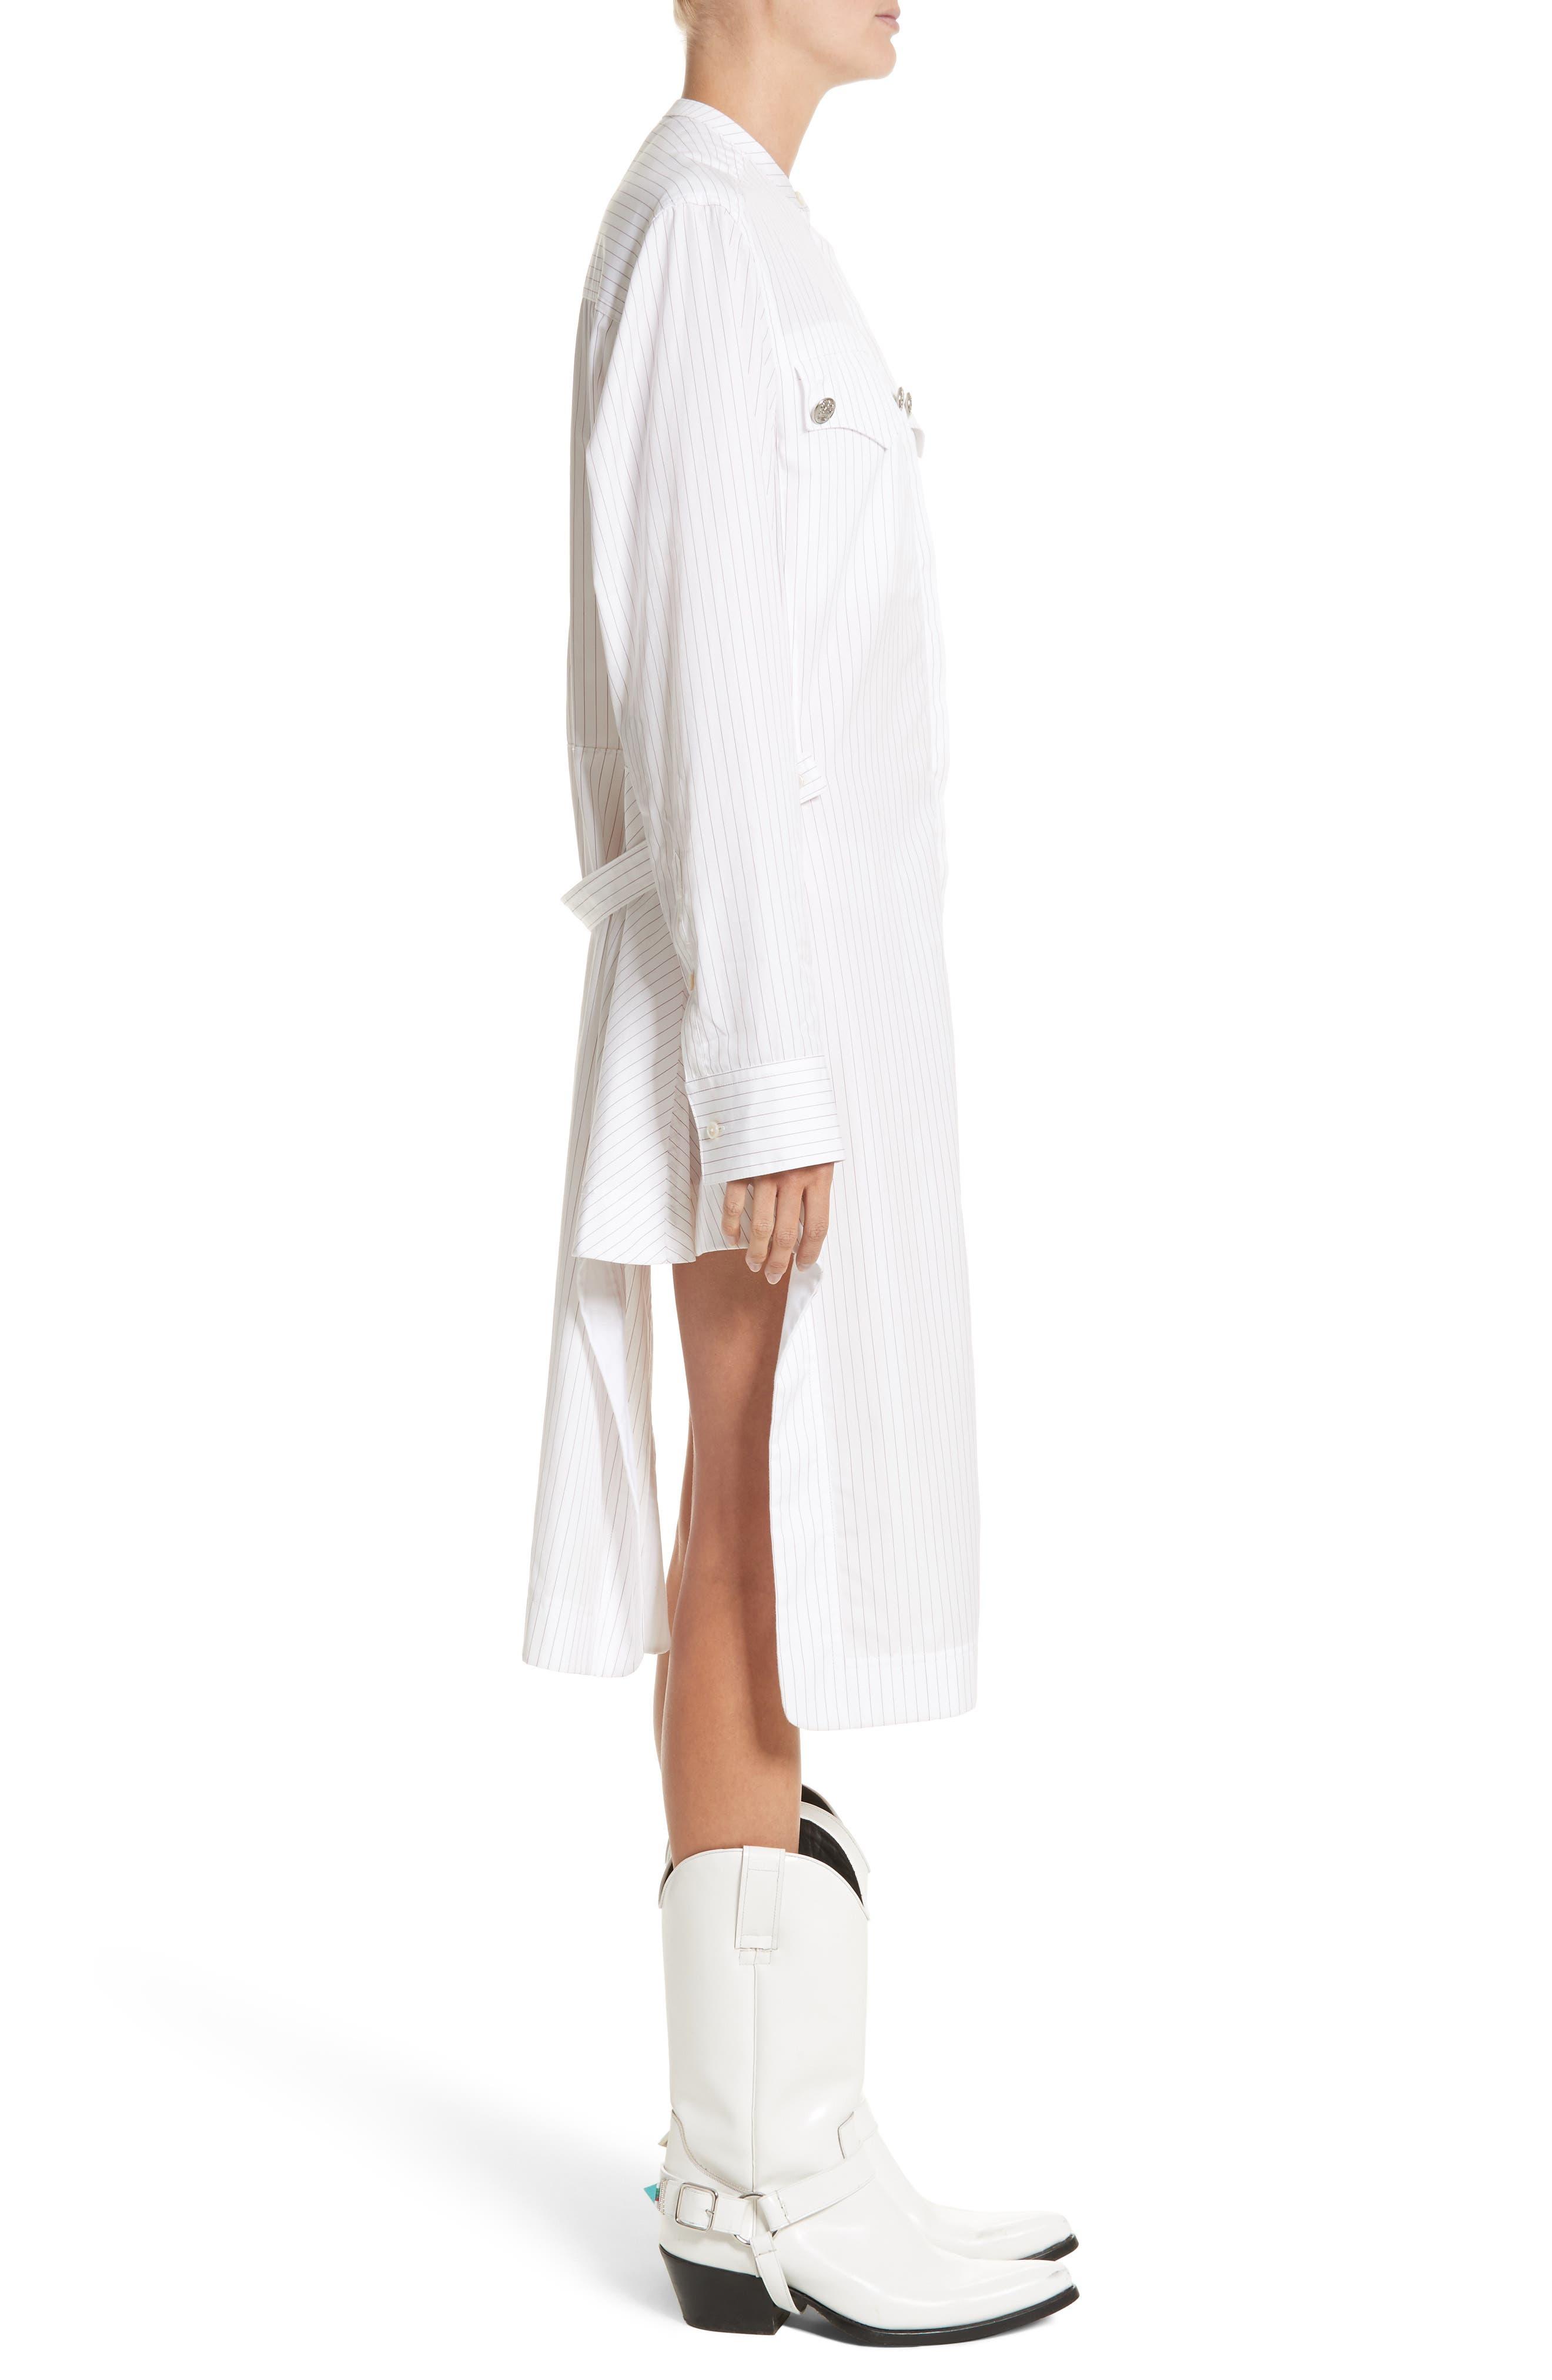 Alternate Image 3  - Calvin Klein 205W39NYC Pinstripe Cotton Poplin Dress